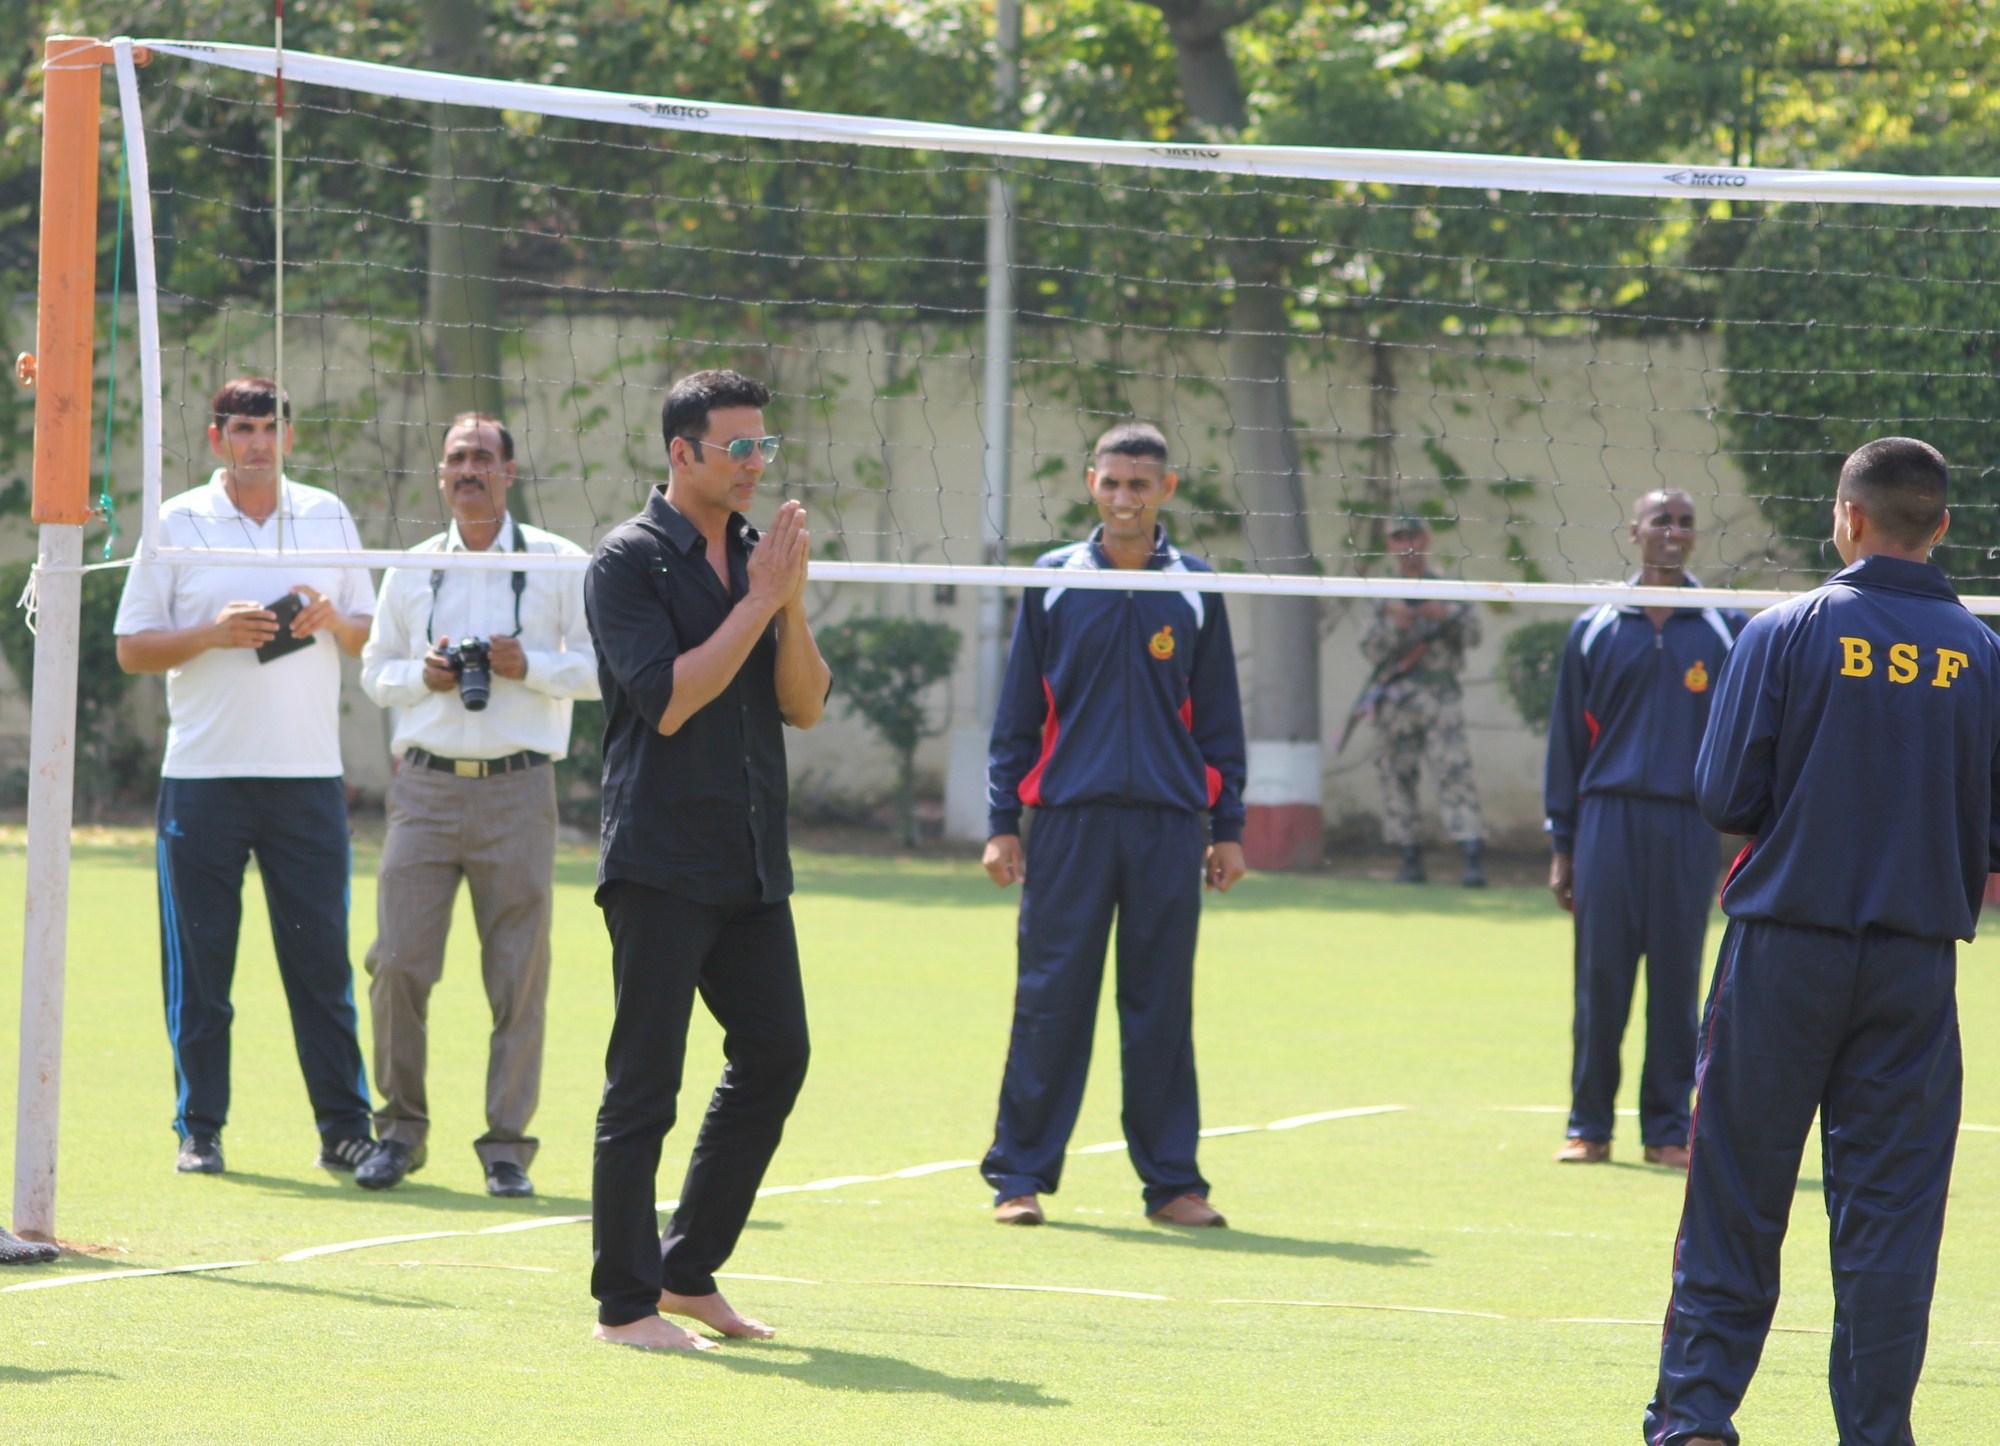 Akshay KUmar with BSF Jawans (1)